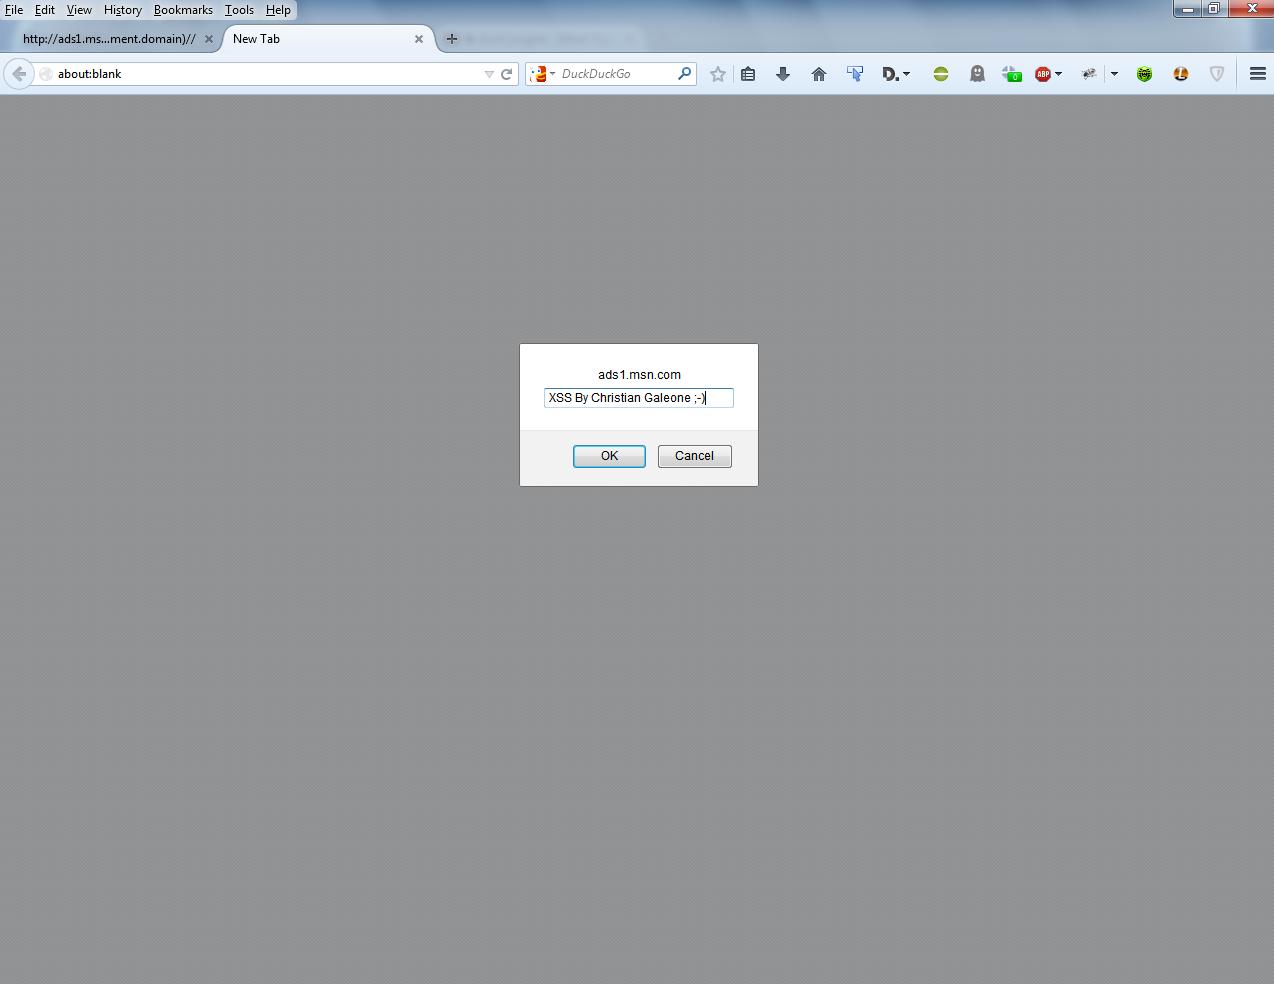 how to avoid cross site scripting xss vulnerabilities